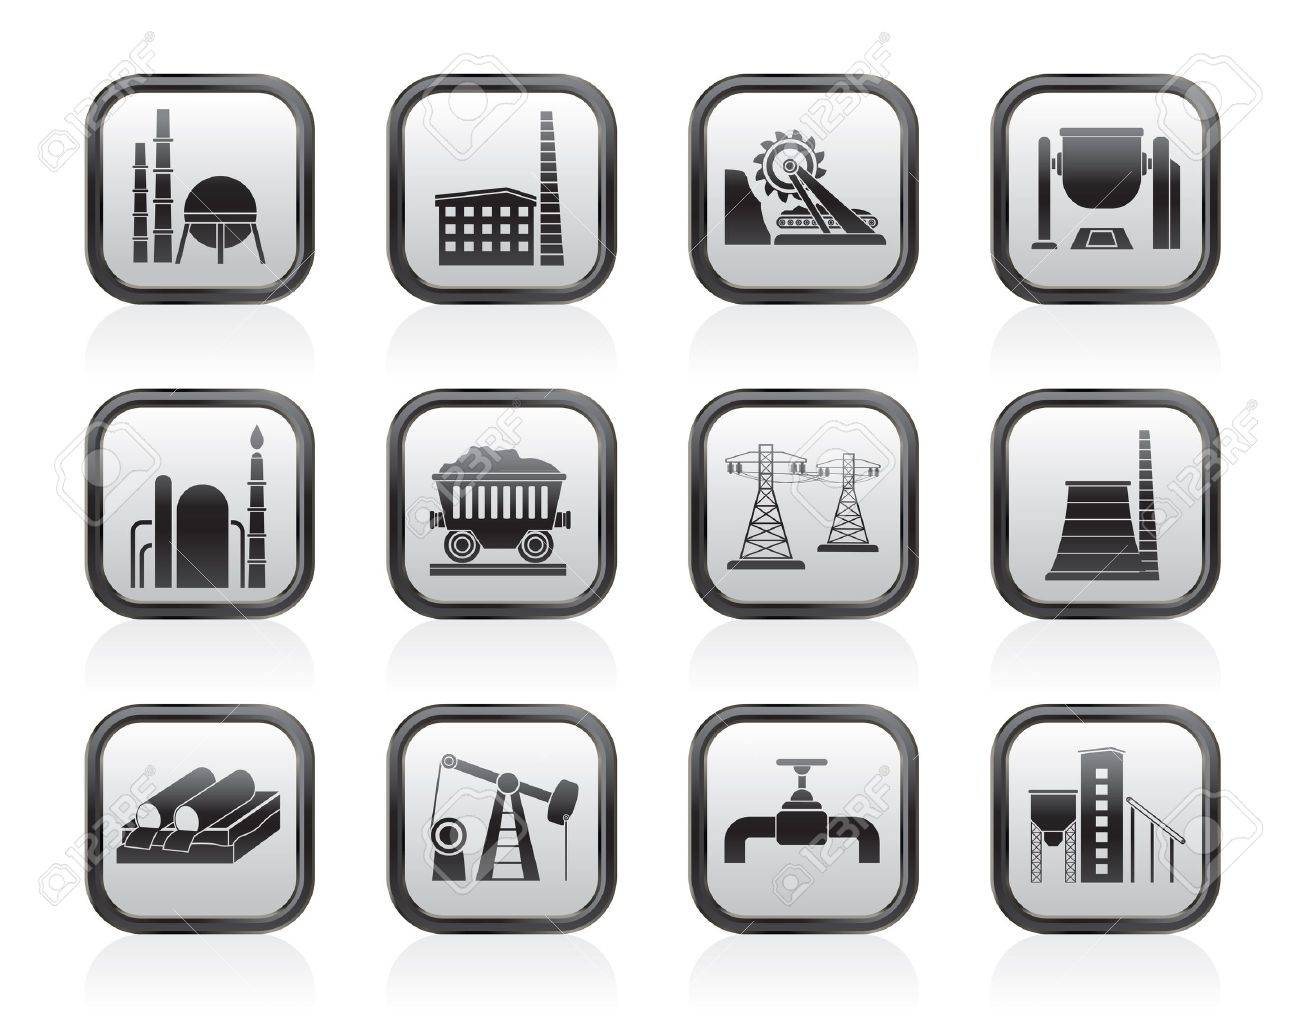 Heavy industry icons - vector icon set Stock Vector - 13910985